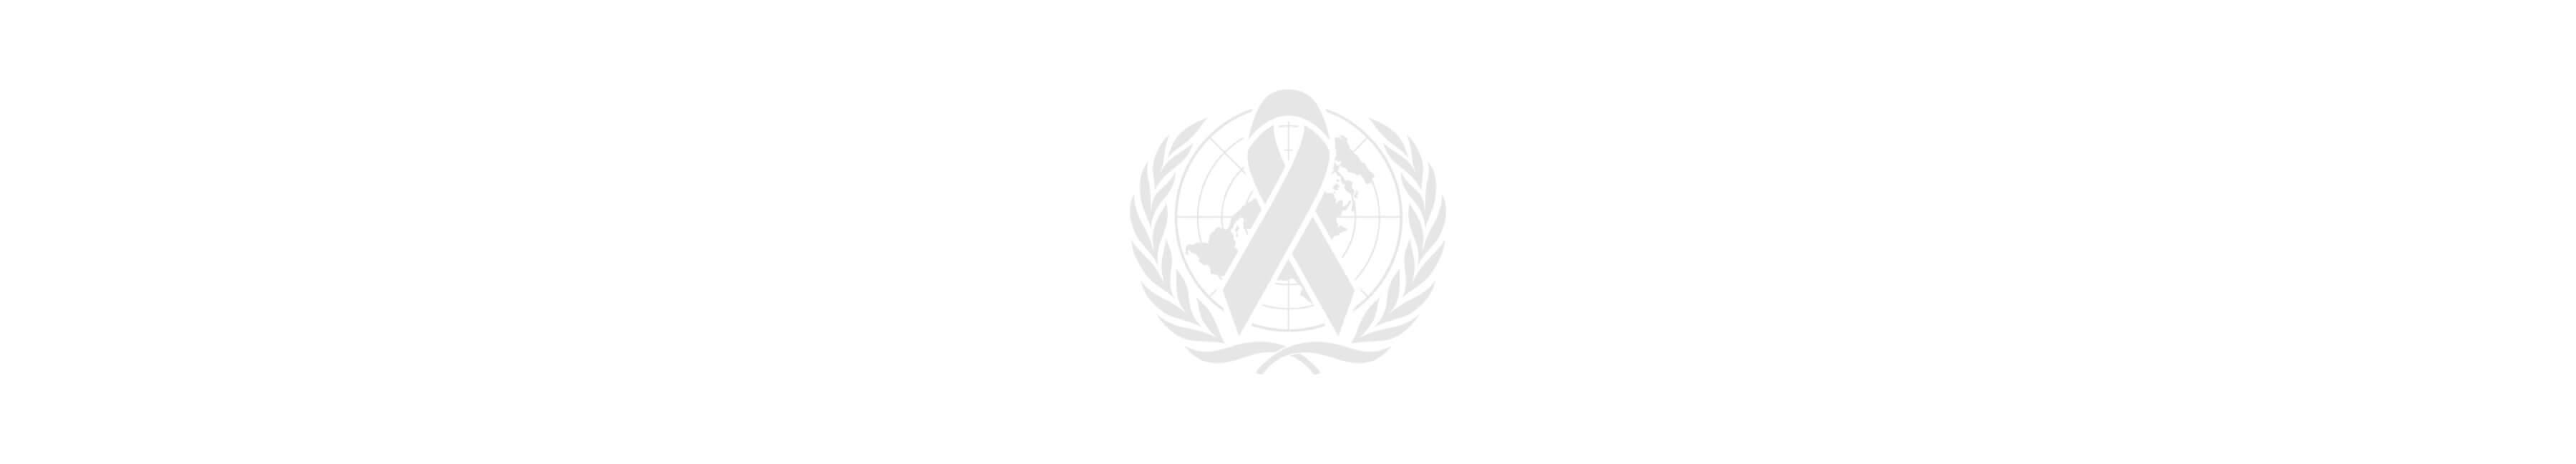 UNAIDS - Blossom